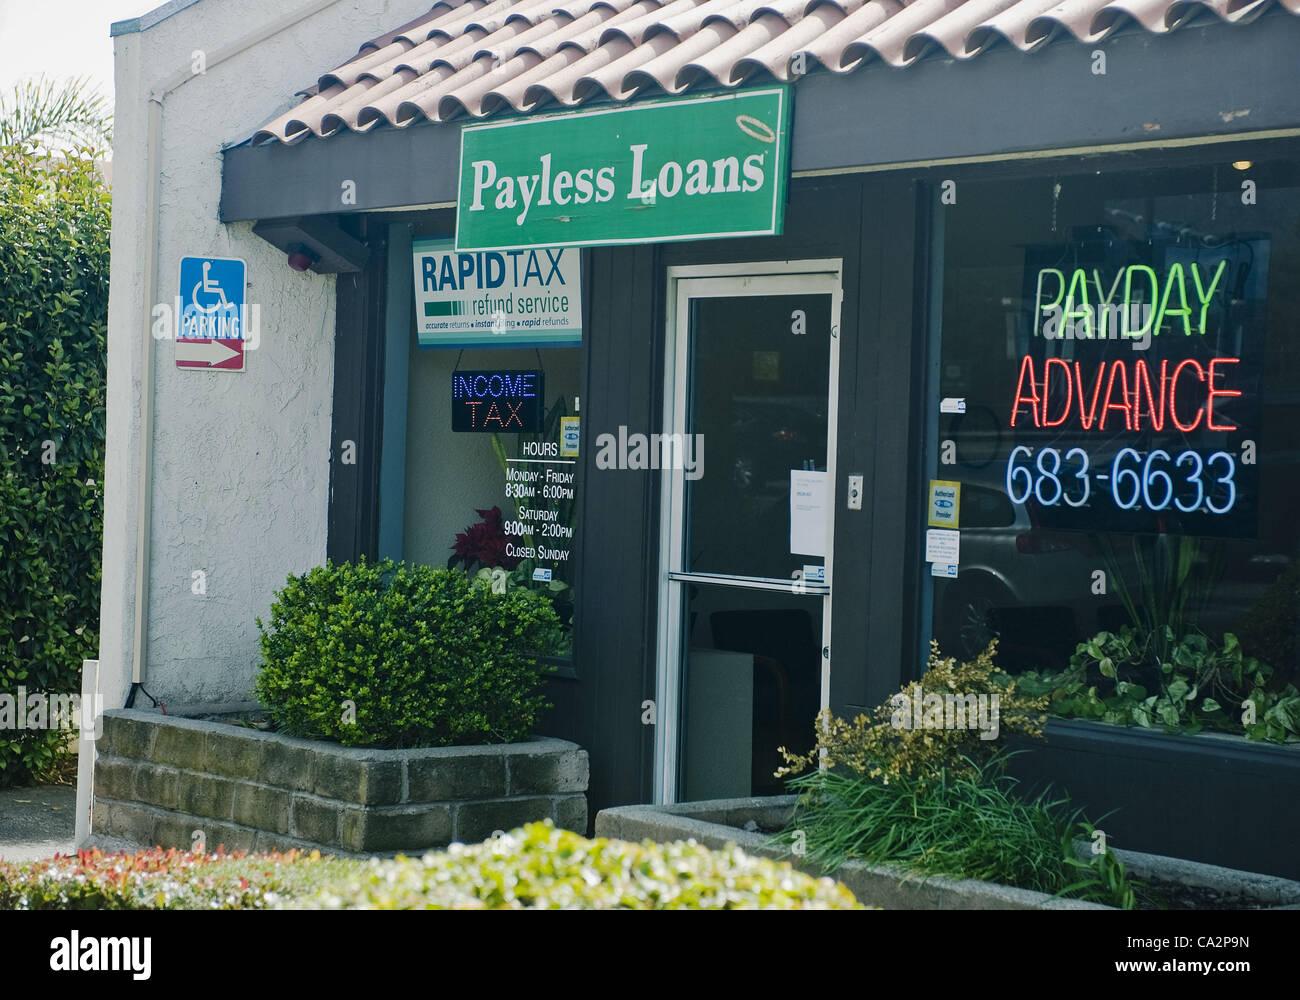 Posb cash advance charges image 1